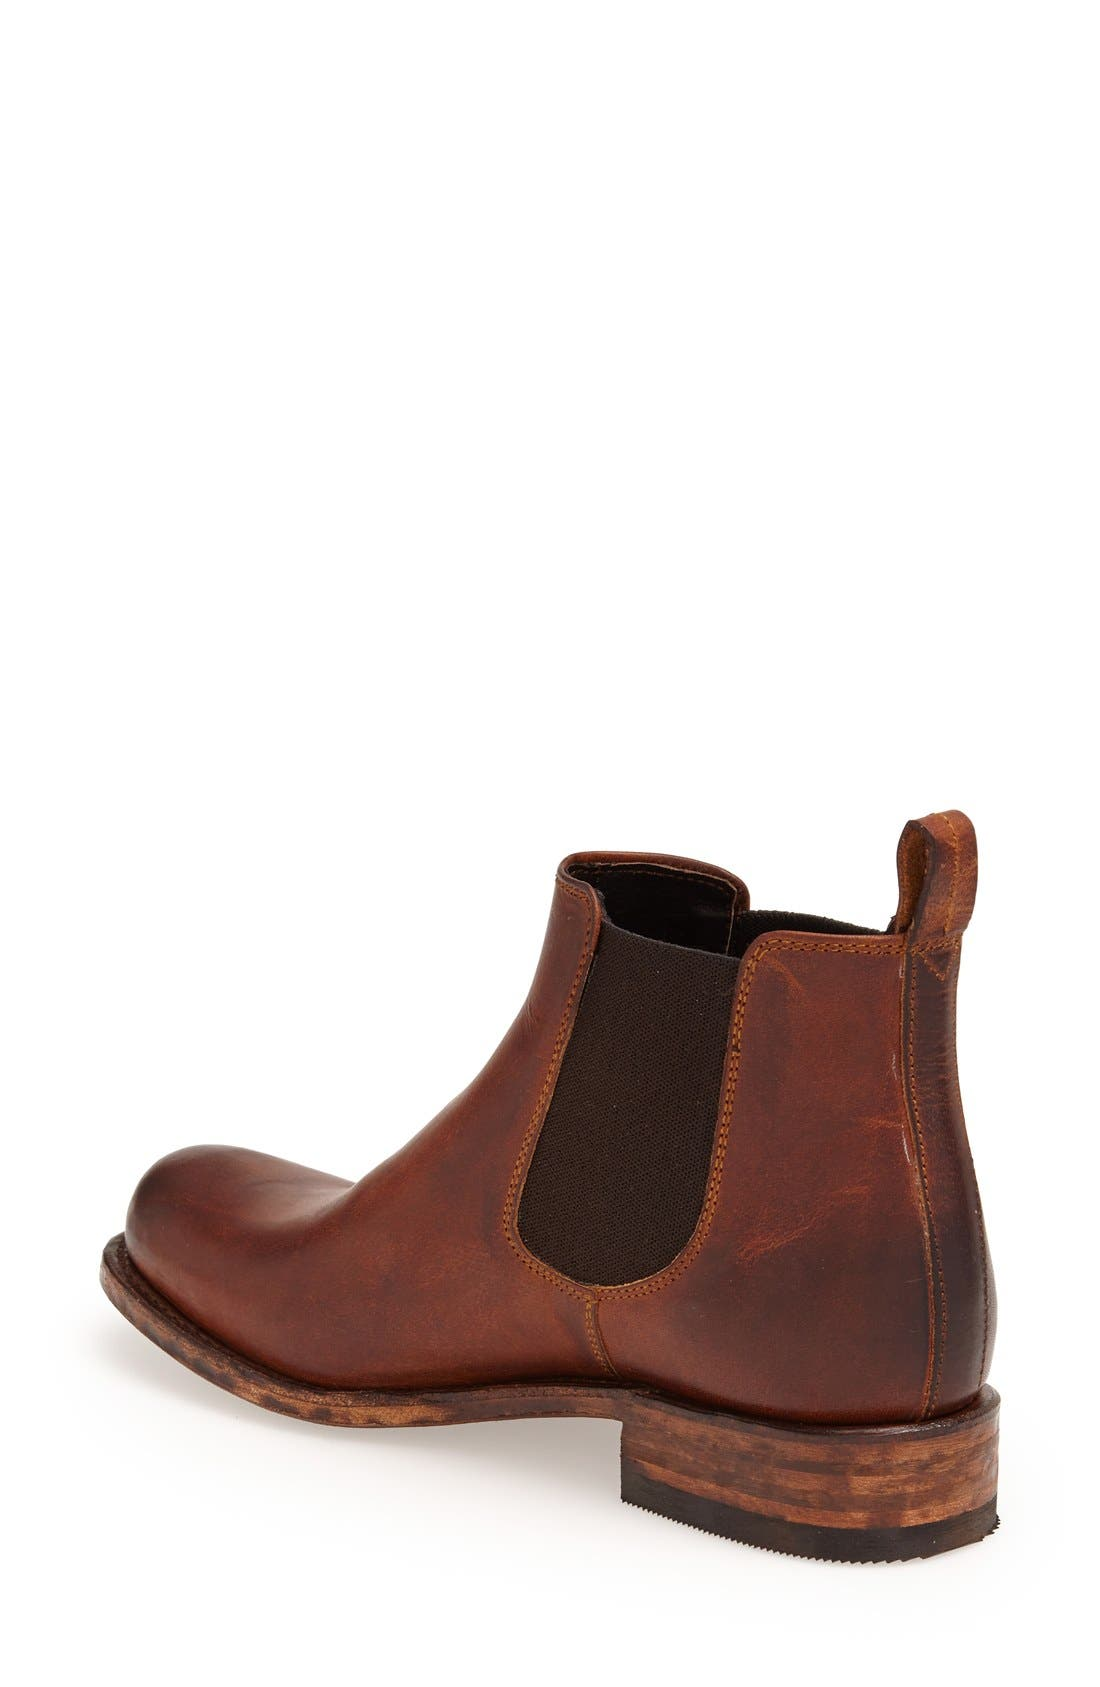 Alternate Image 2  - Sendra 'Barret' Chelsea Boot (Women)